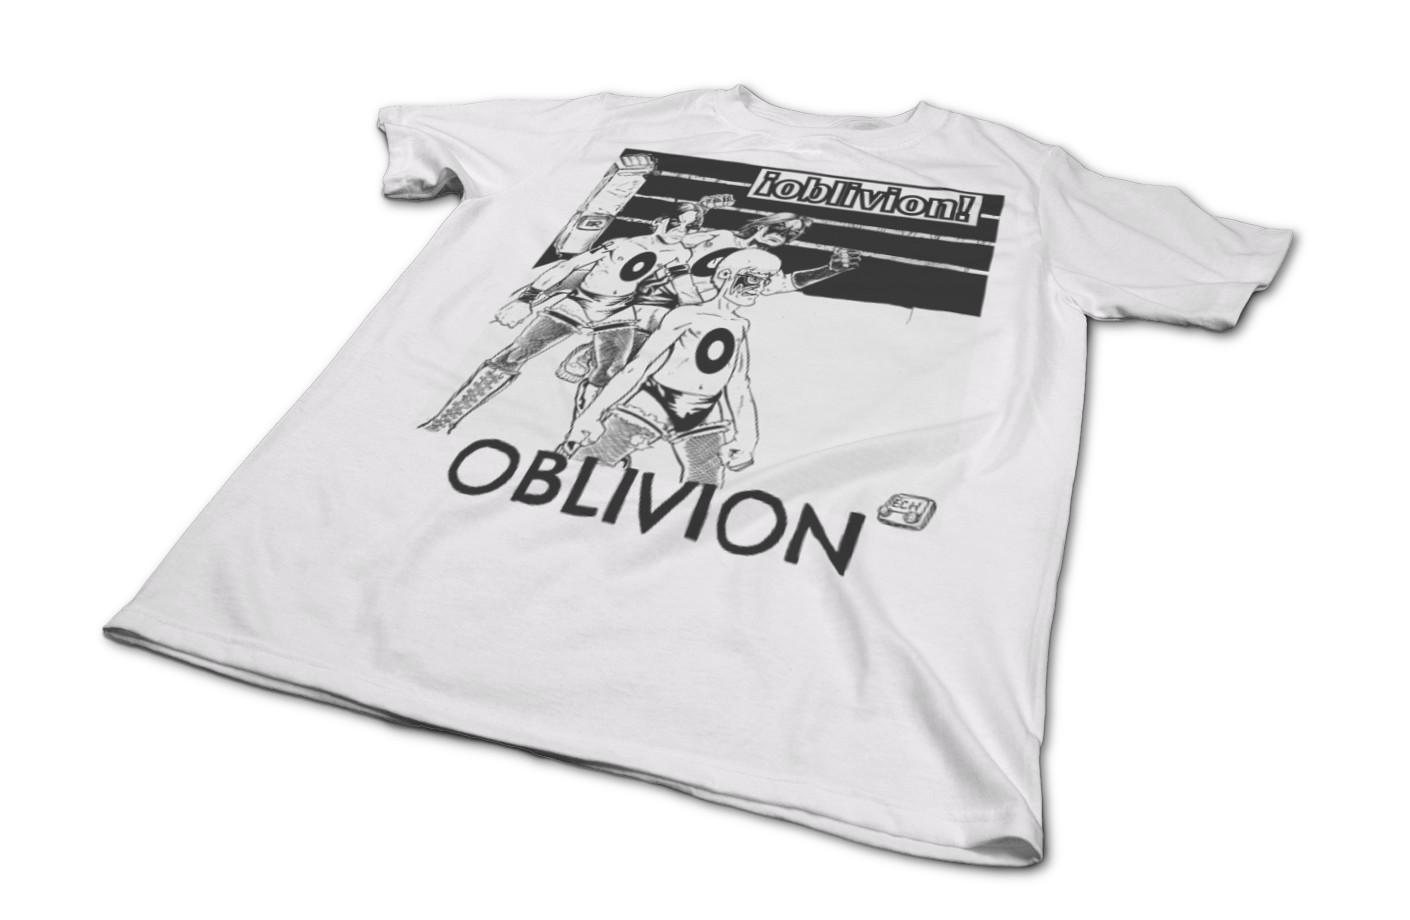 Oblivion oblivionsplit 1527979719